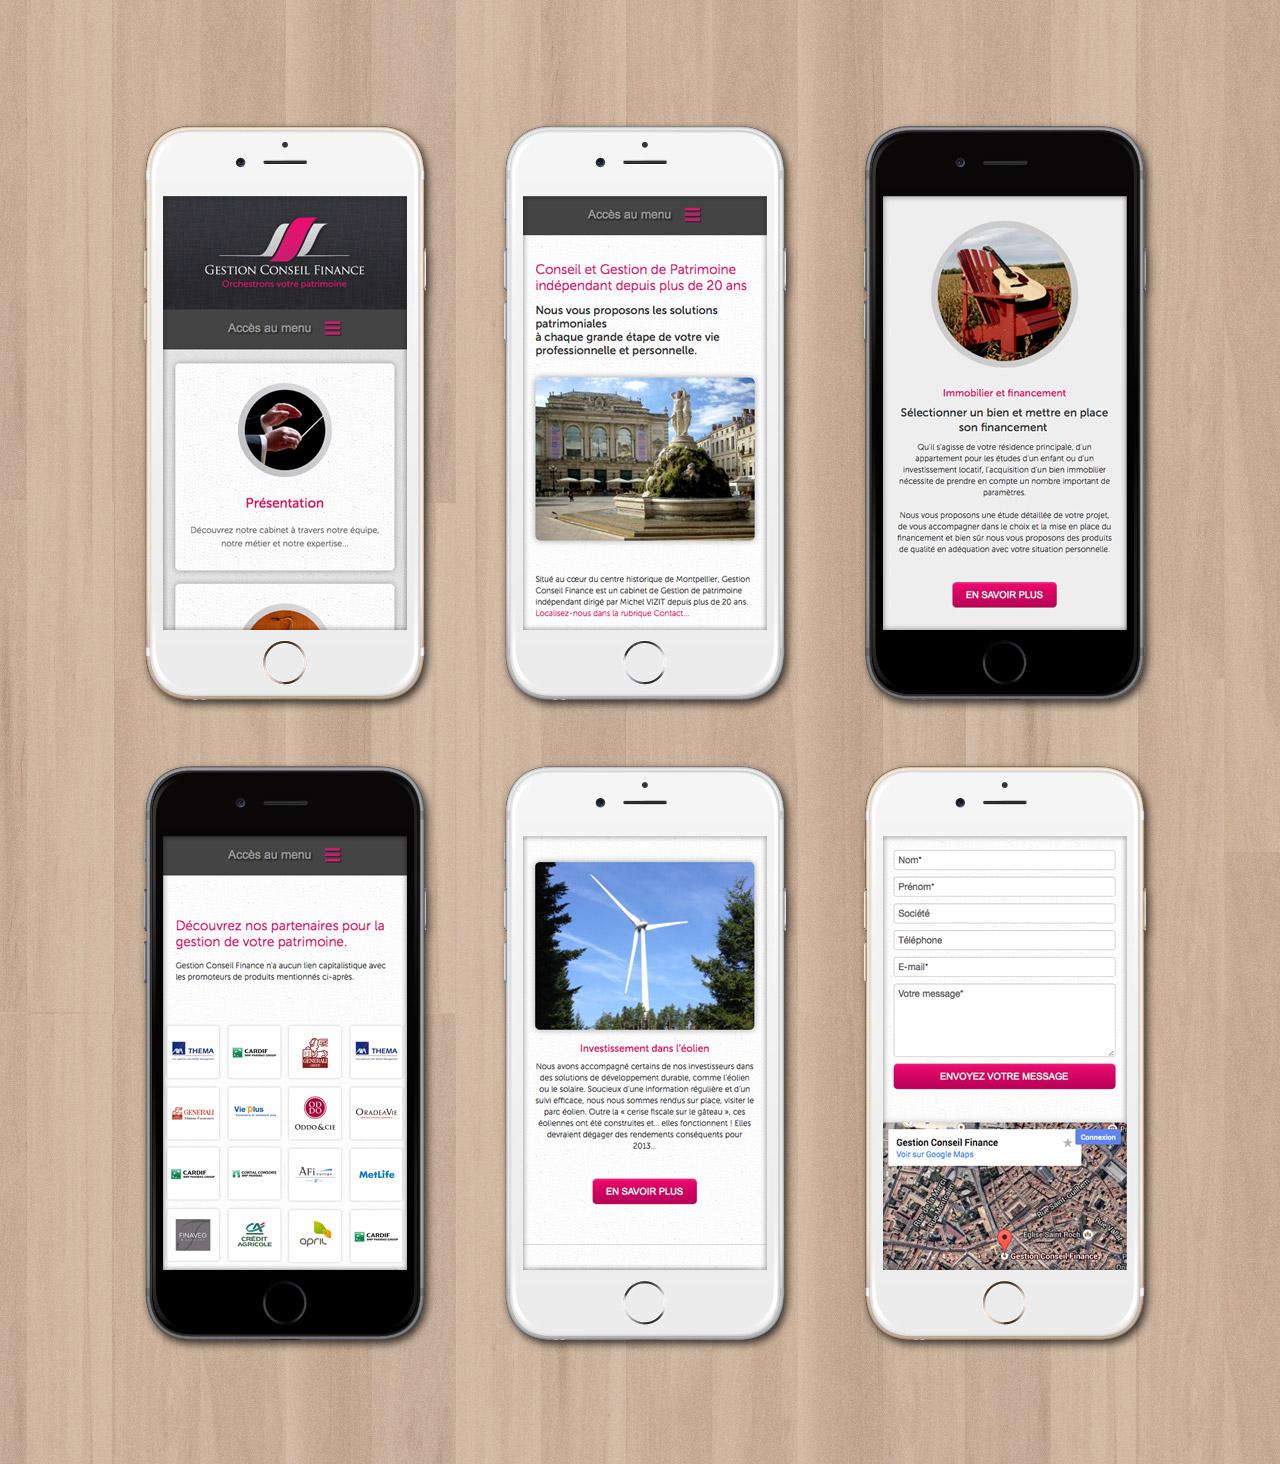 gestion-conseil-finance-site-mobile-responsive-design-creation-communication-caconcept-alexis-cretin-graphiste